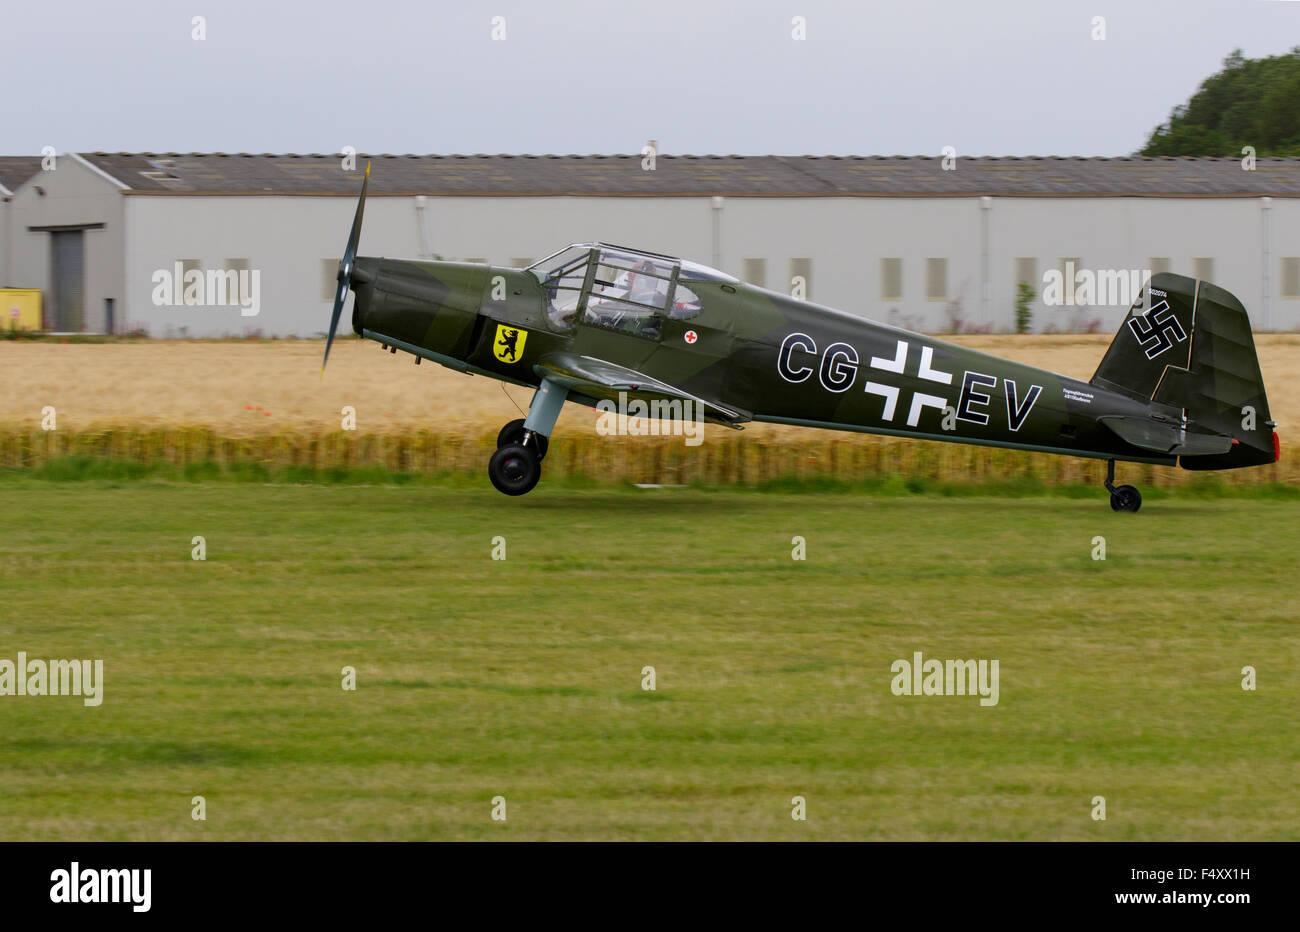 Gomhouria 181 MK6 (Bucker Bestman) CG-EV G-CGEV landing at Breighton Airfield - Stock Image